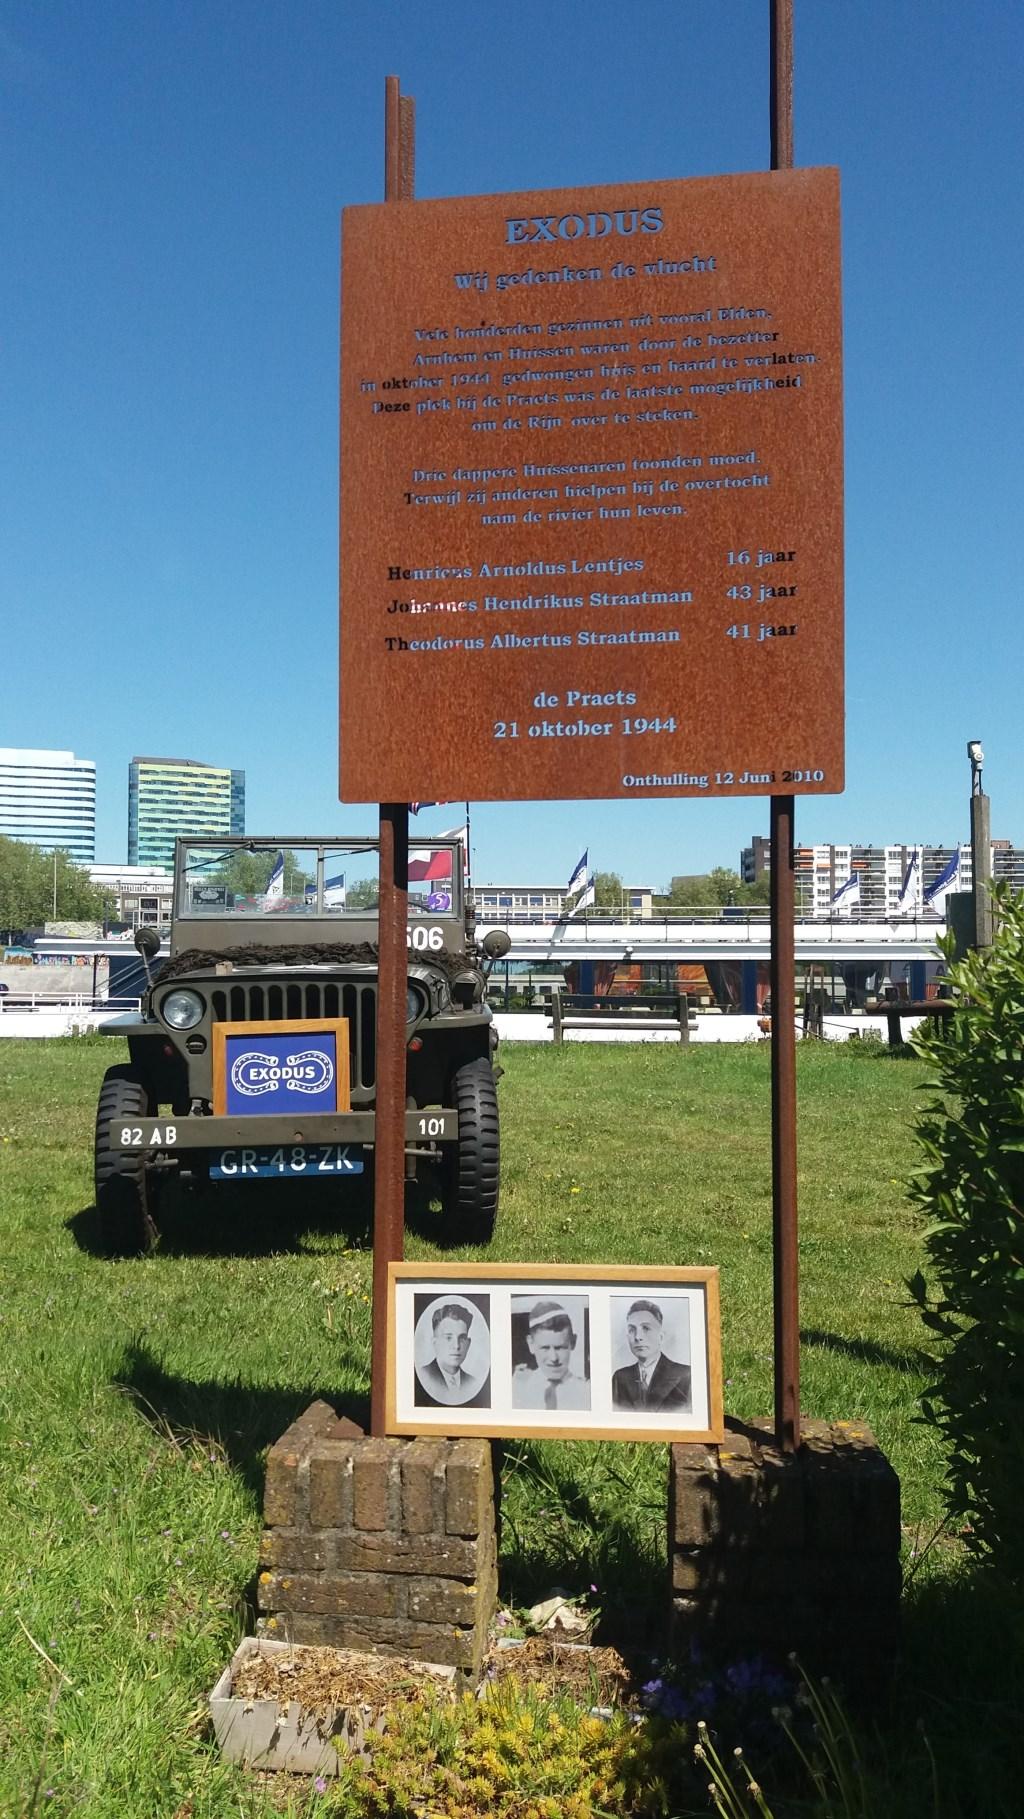 Exodusmonument op De Praets te Arnhem/Elden